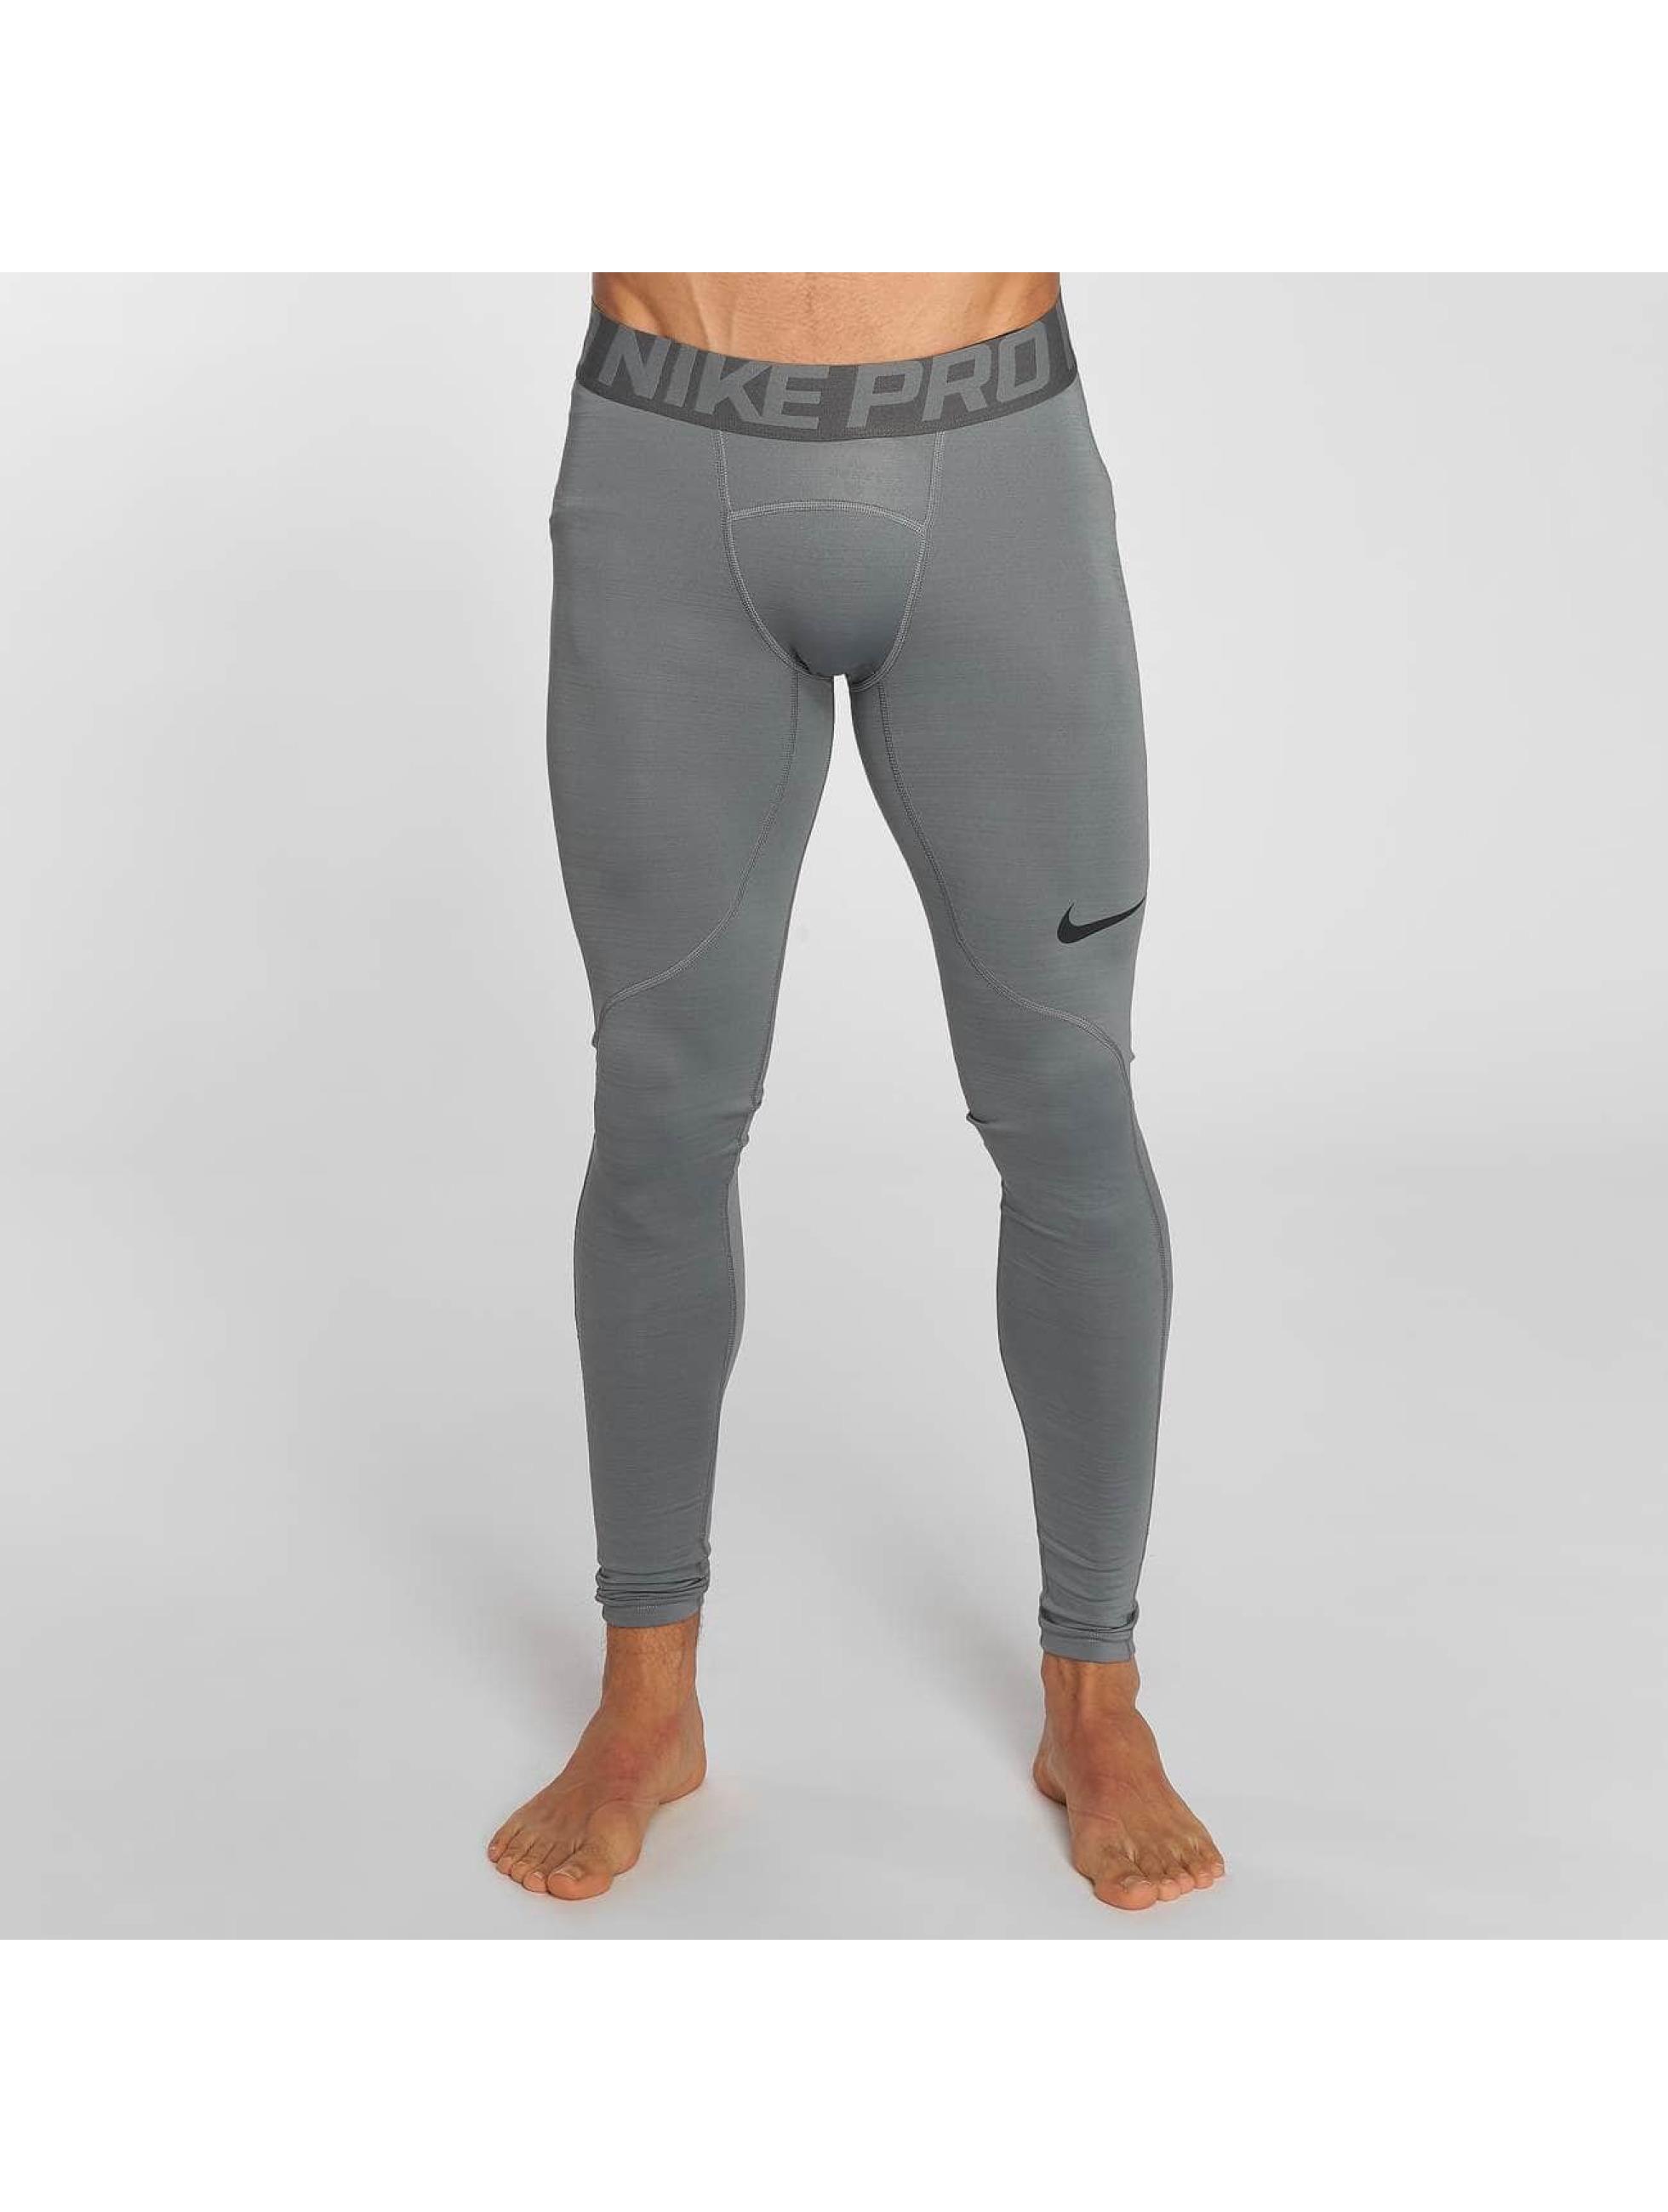 Nike Performance Legging/Tregging Pro Warm grey